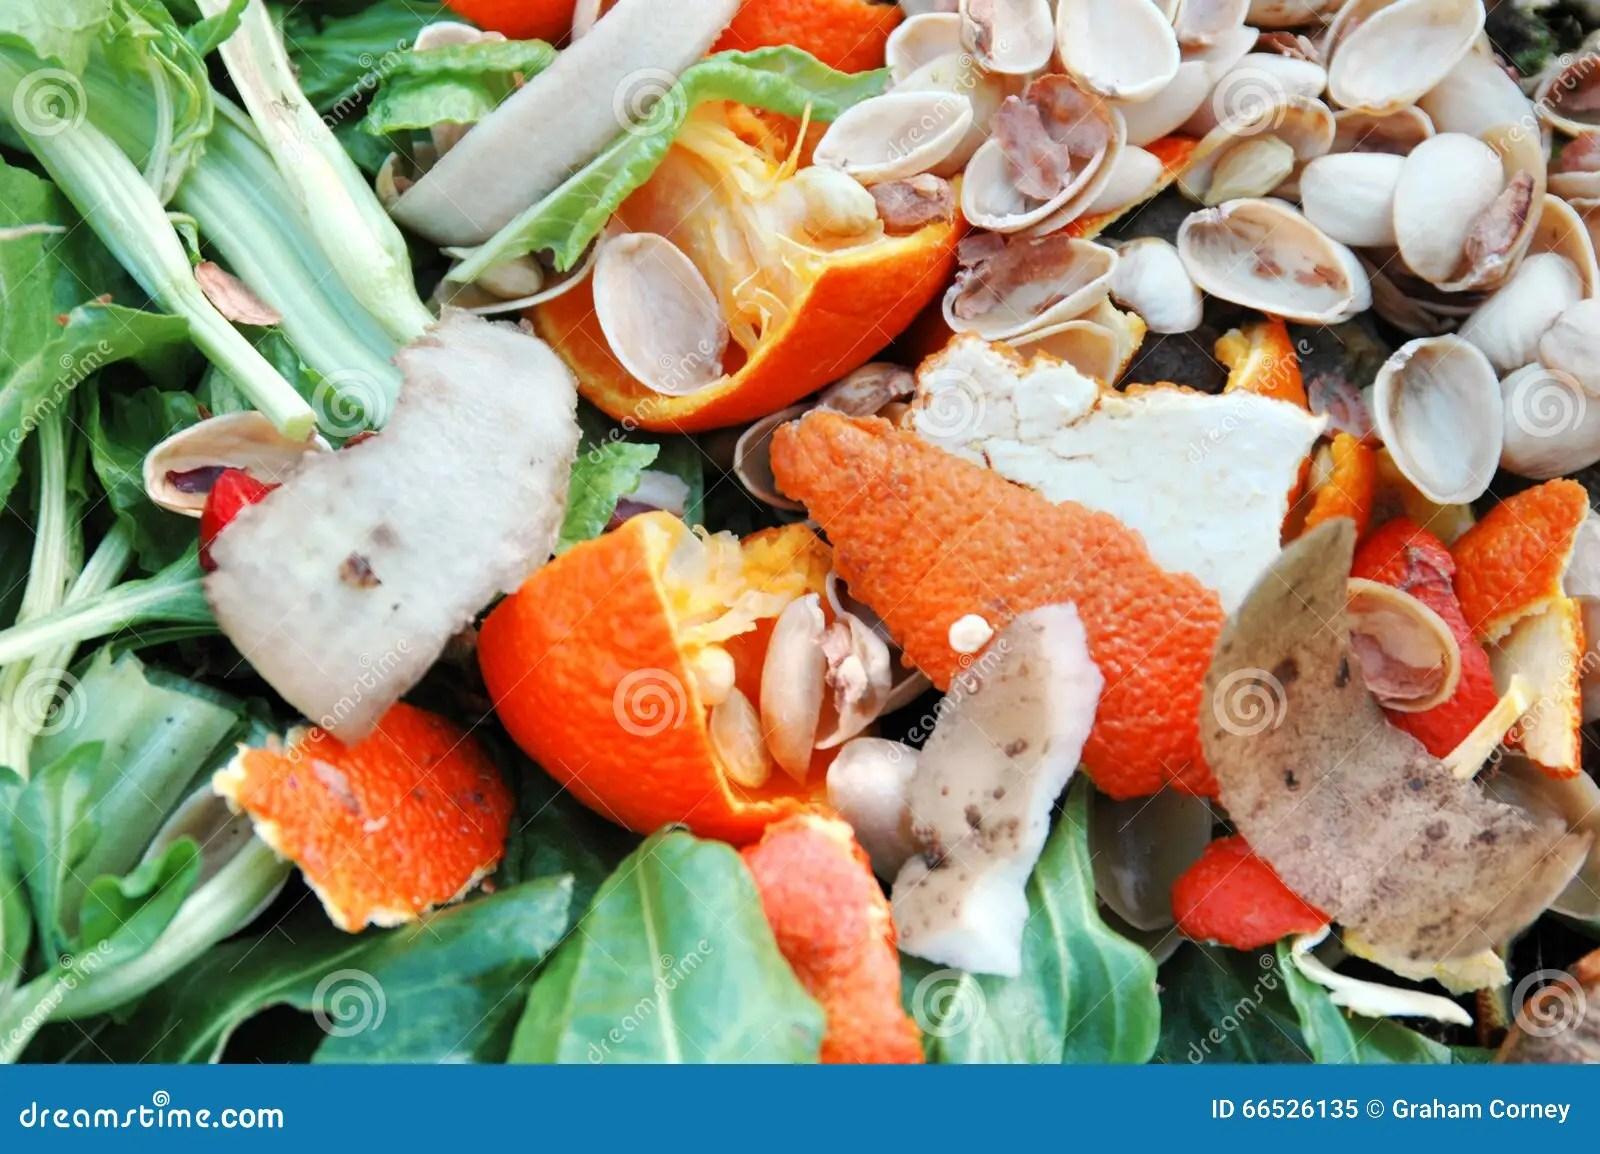 kitchen compost container kohler undermount sinks 堆肥材料库存图片 图片包括有从事园艺 回收 螺母 土豆 芹菜 厨房 在庭院天然肥料堆的厨房废物